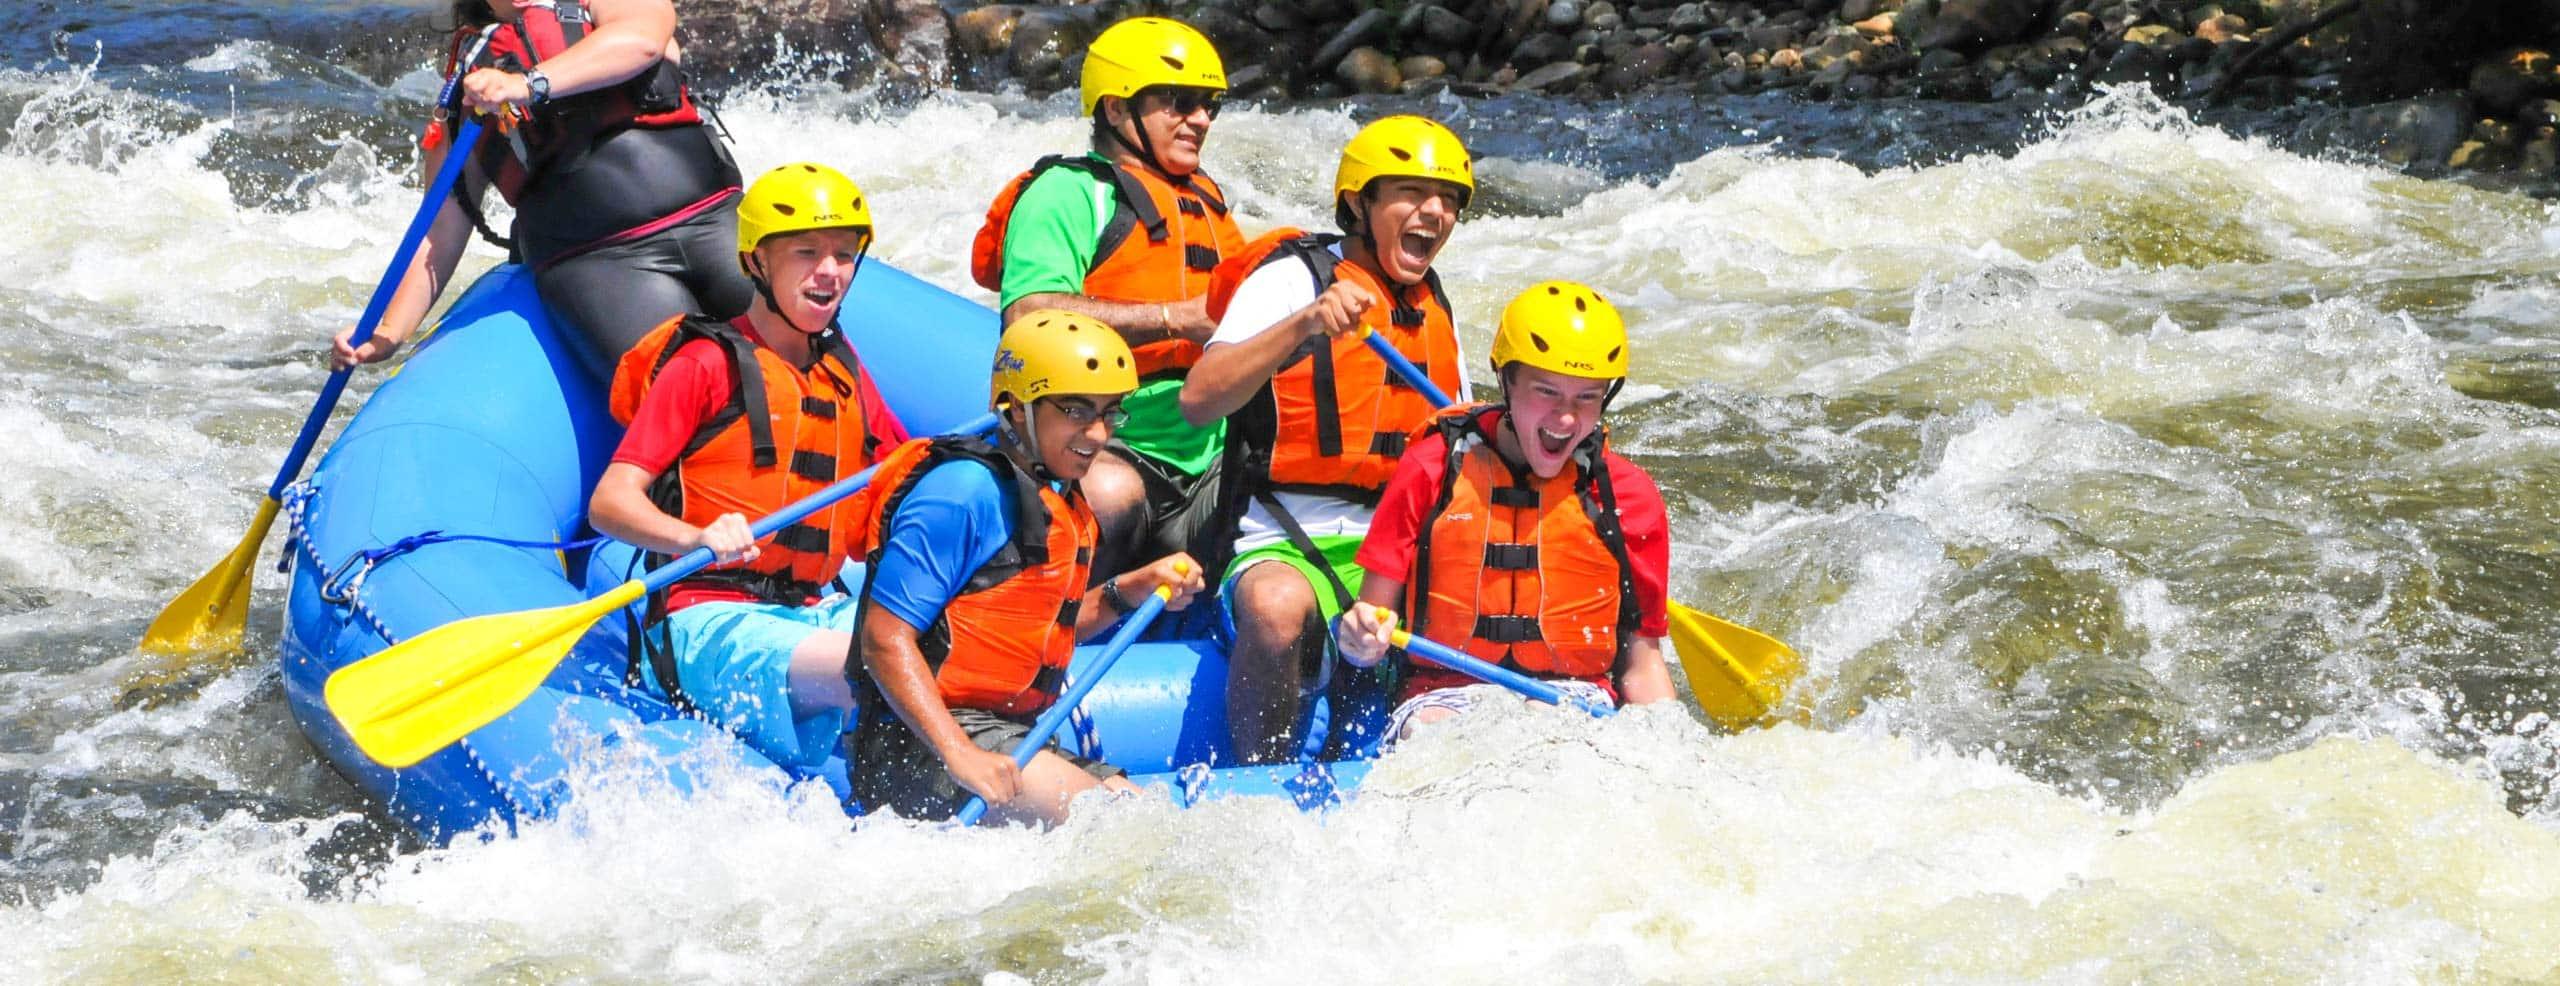 Boys rafting down rapids